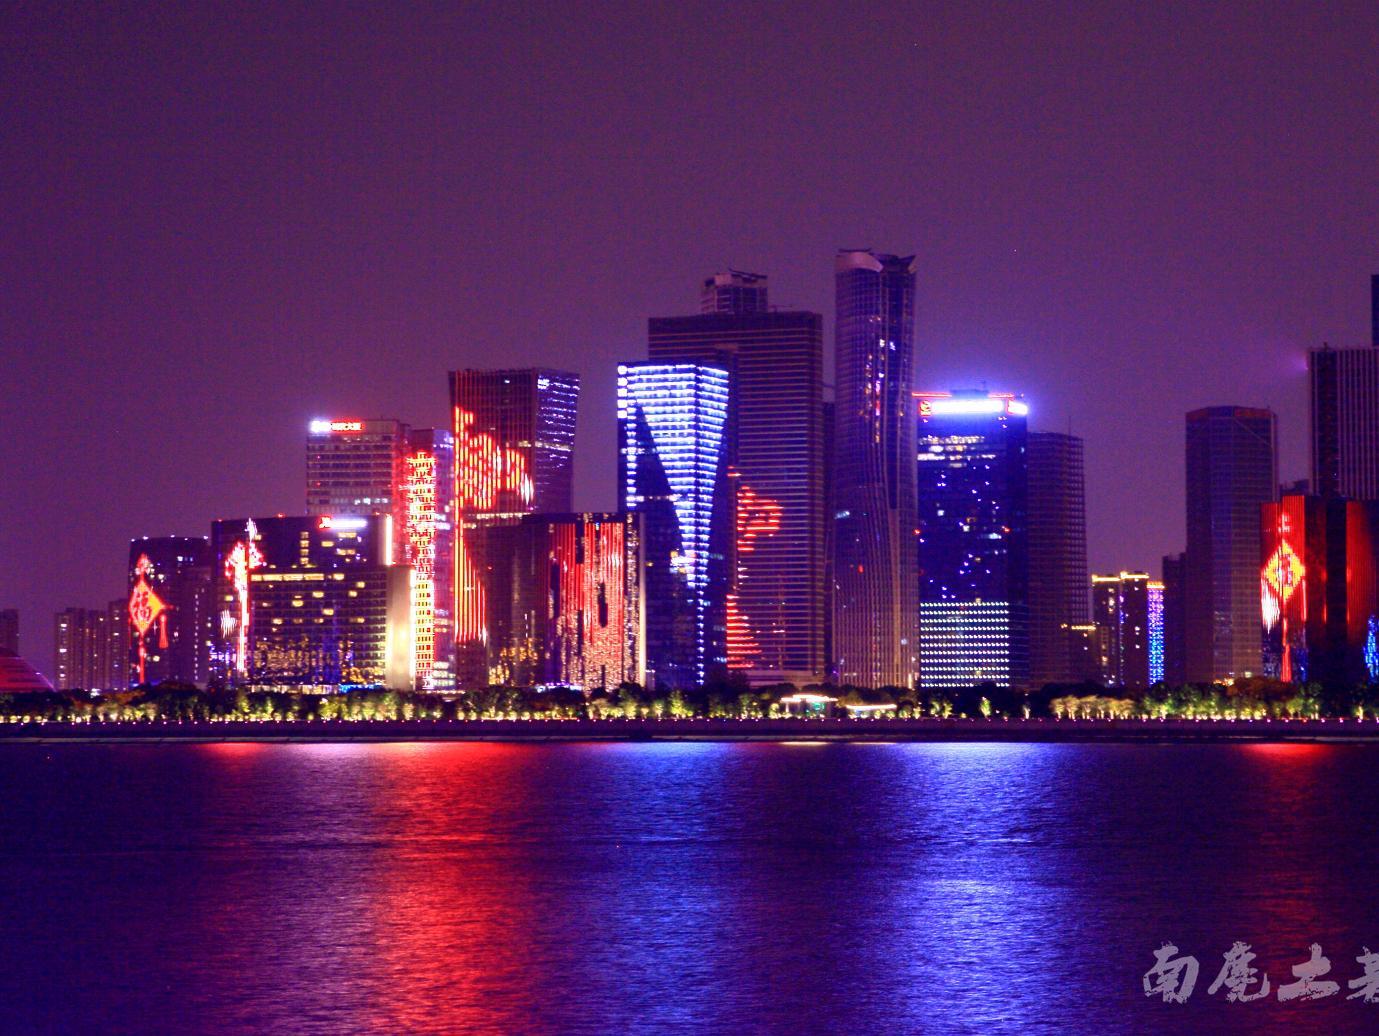 G20杭州新城灯光秀,美到爆